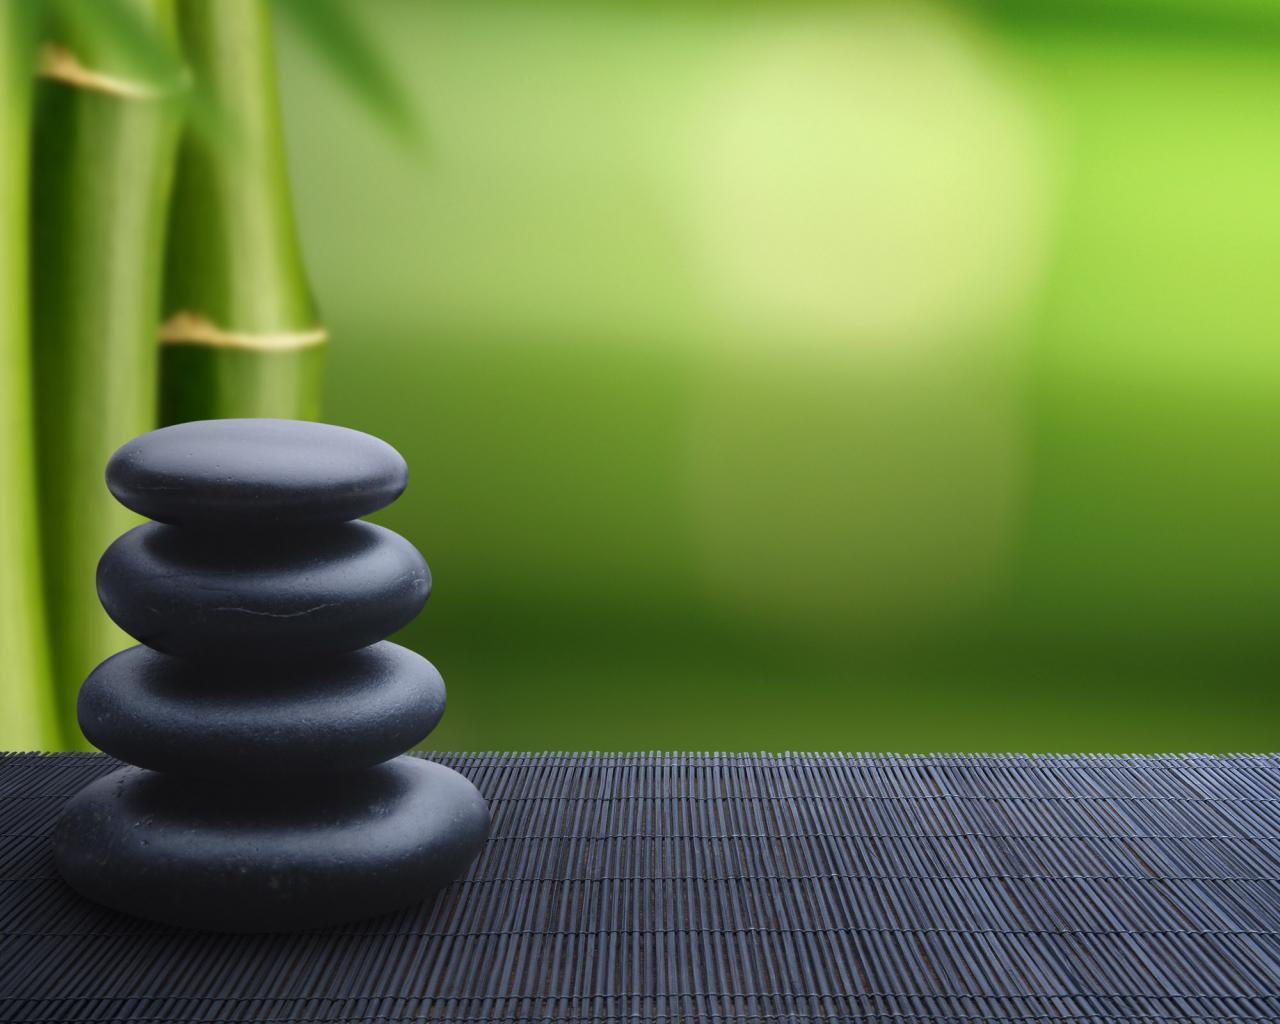 Awakening the Buddha Within Zen Fundamentals can Change Persons 1280x1024